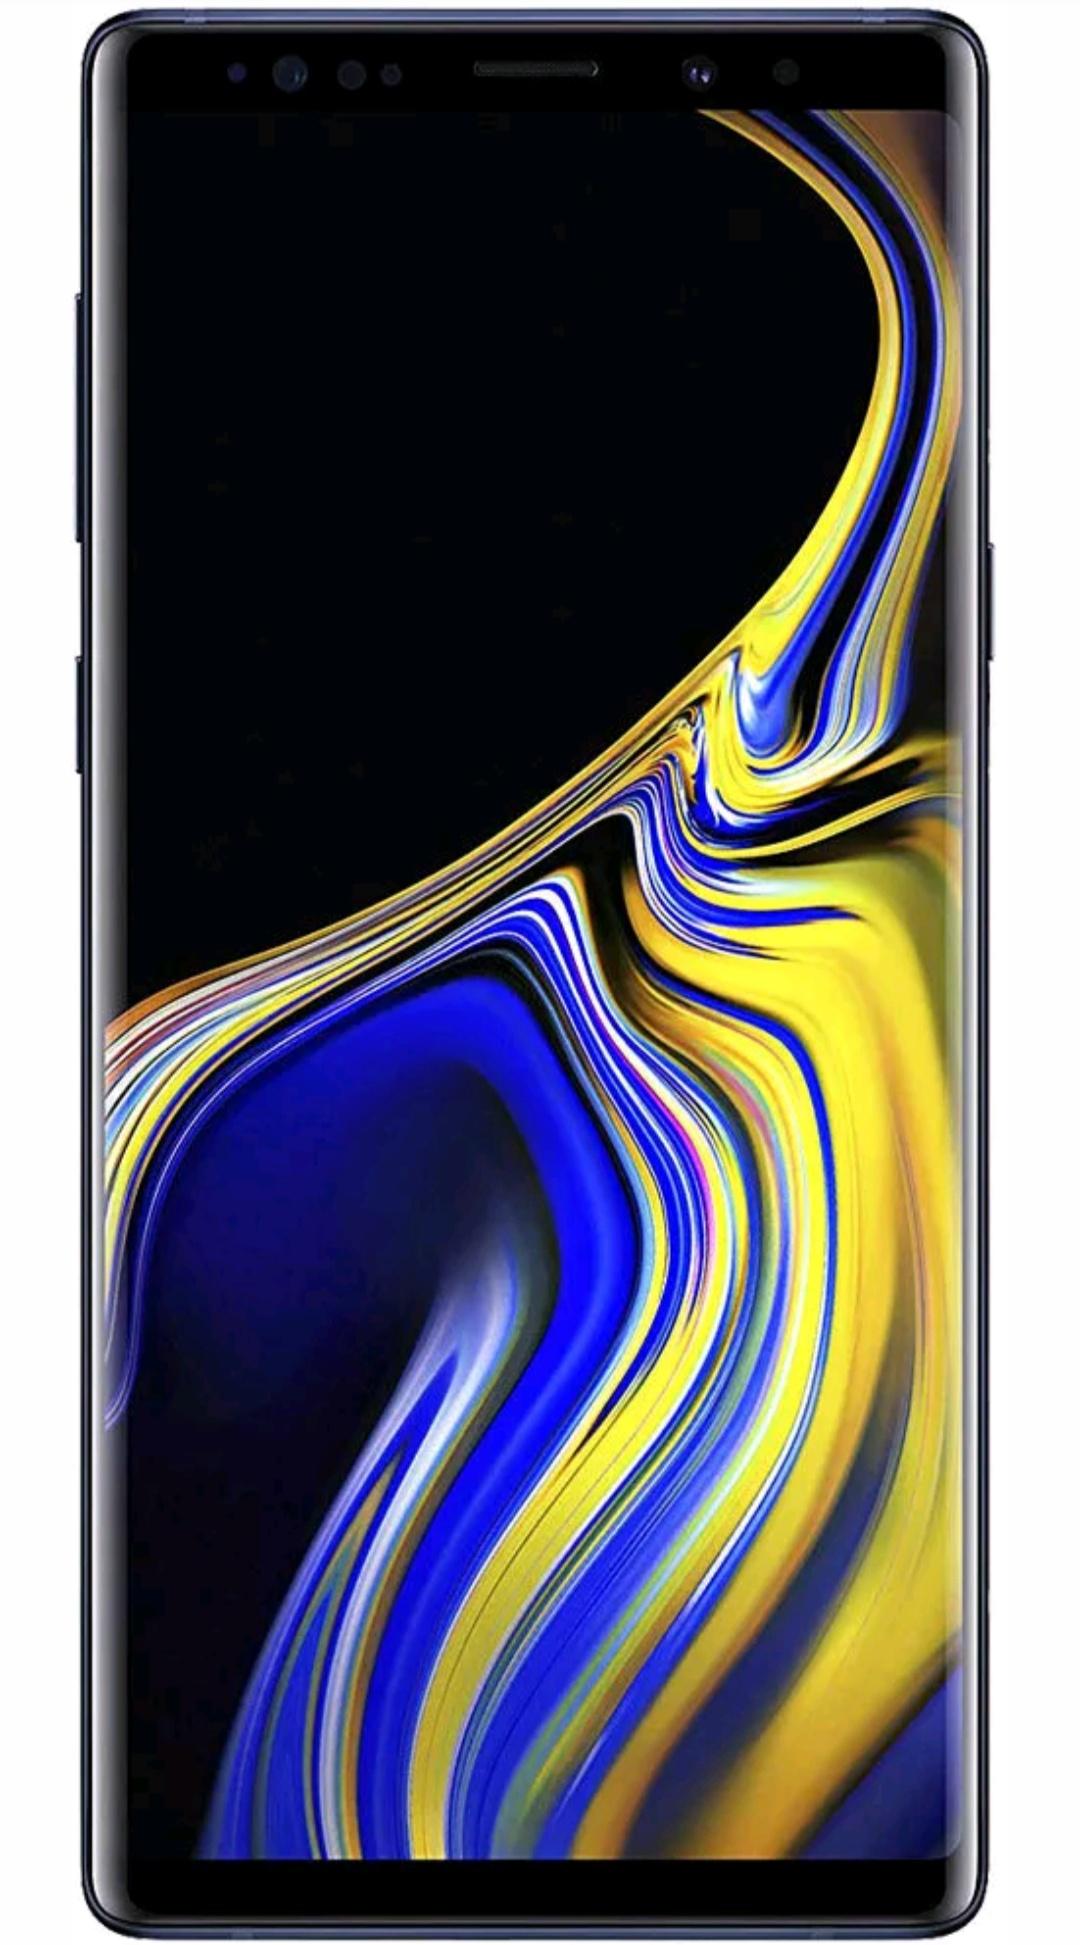 Excellent Condition 512GB 8GB RAM Samsung Galaxy Note 9 N960F SIM Free Unlocked Refurbished Smartphone £525.10 @ Envirofone Ebay